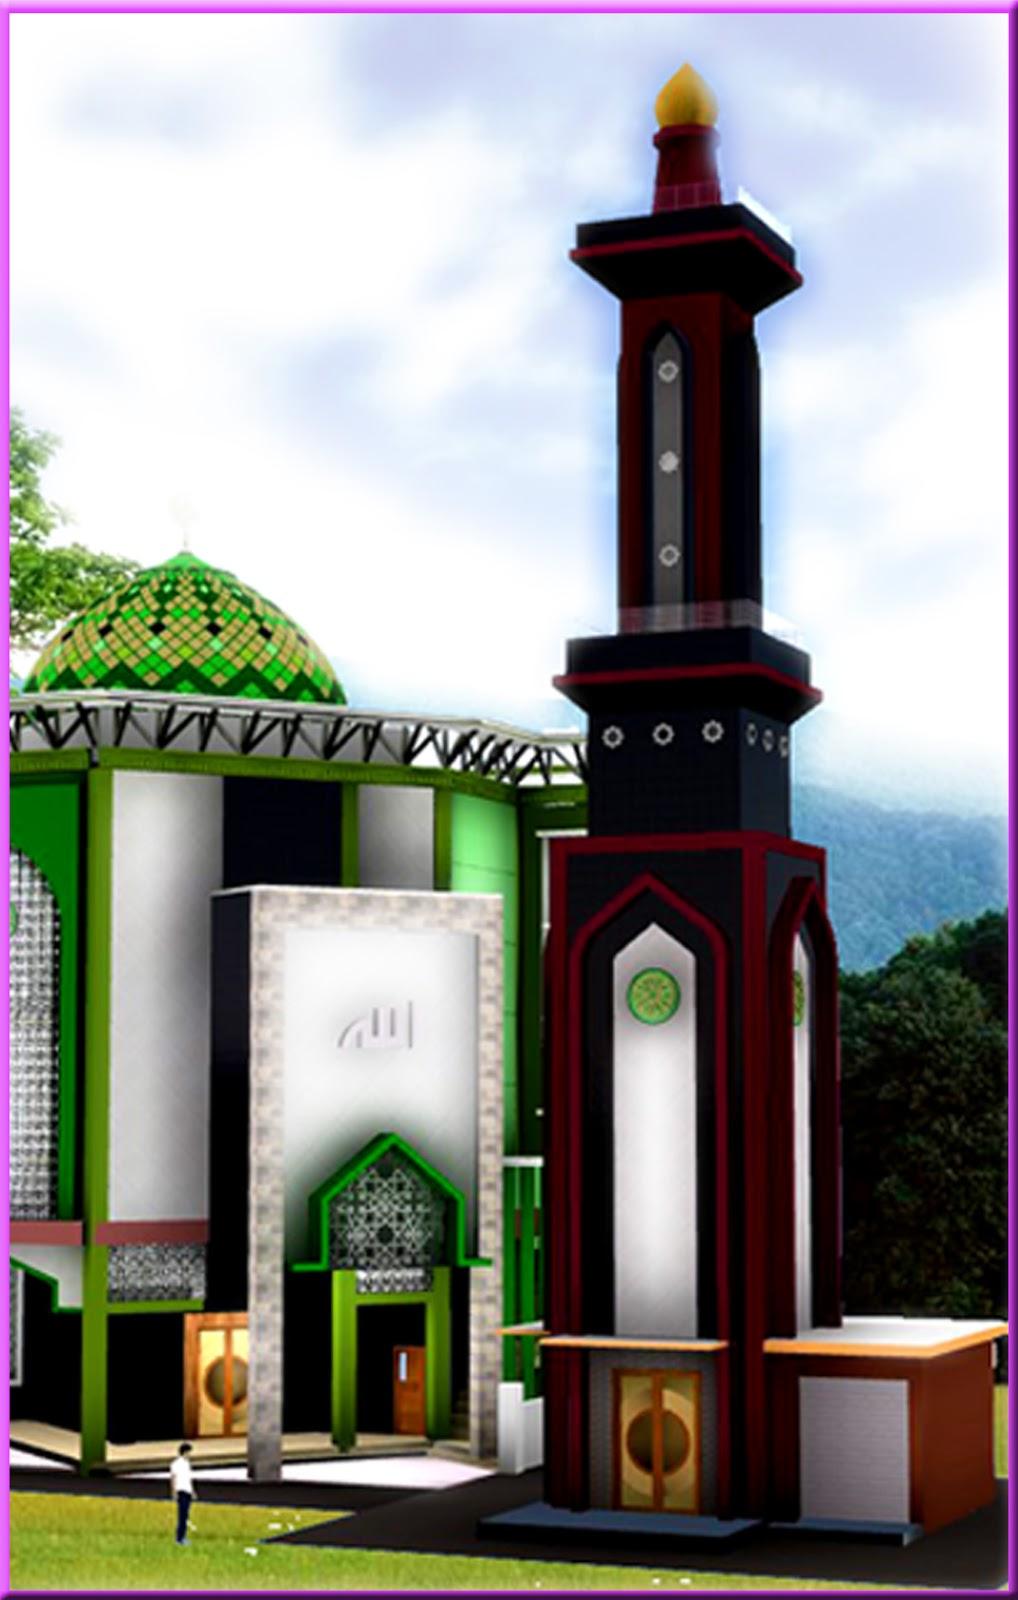 Berita Arsitek Sipil Contoh Gambar Autocad Menara Masjid Tinggi 27 M